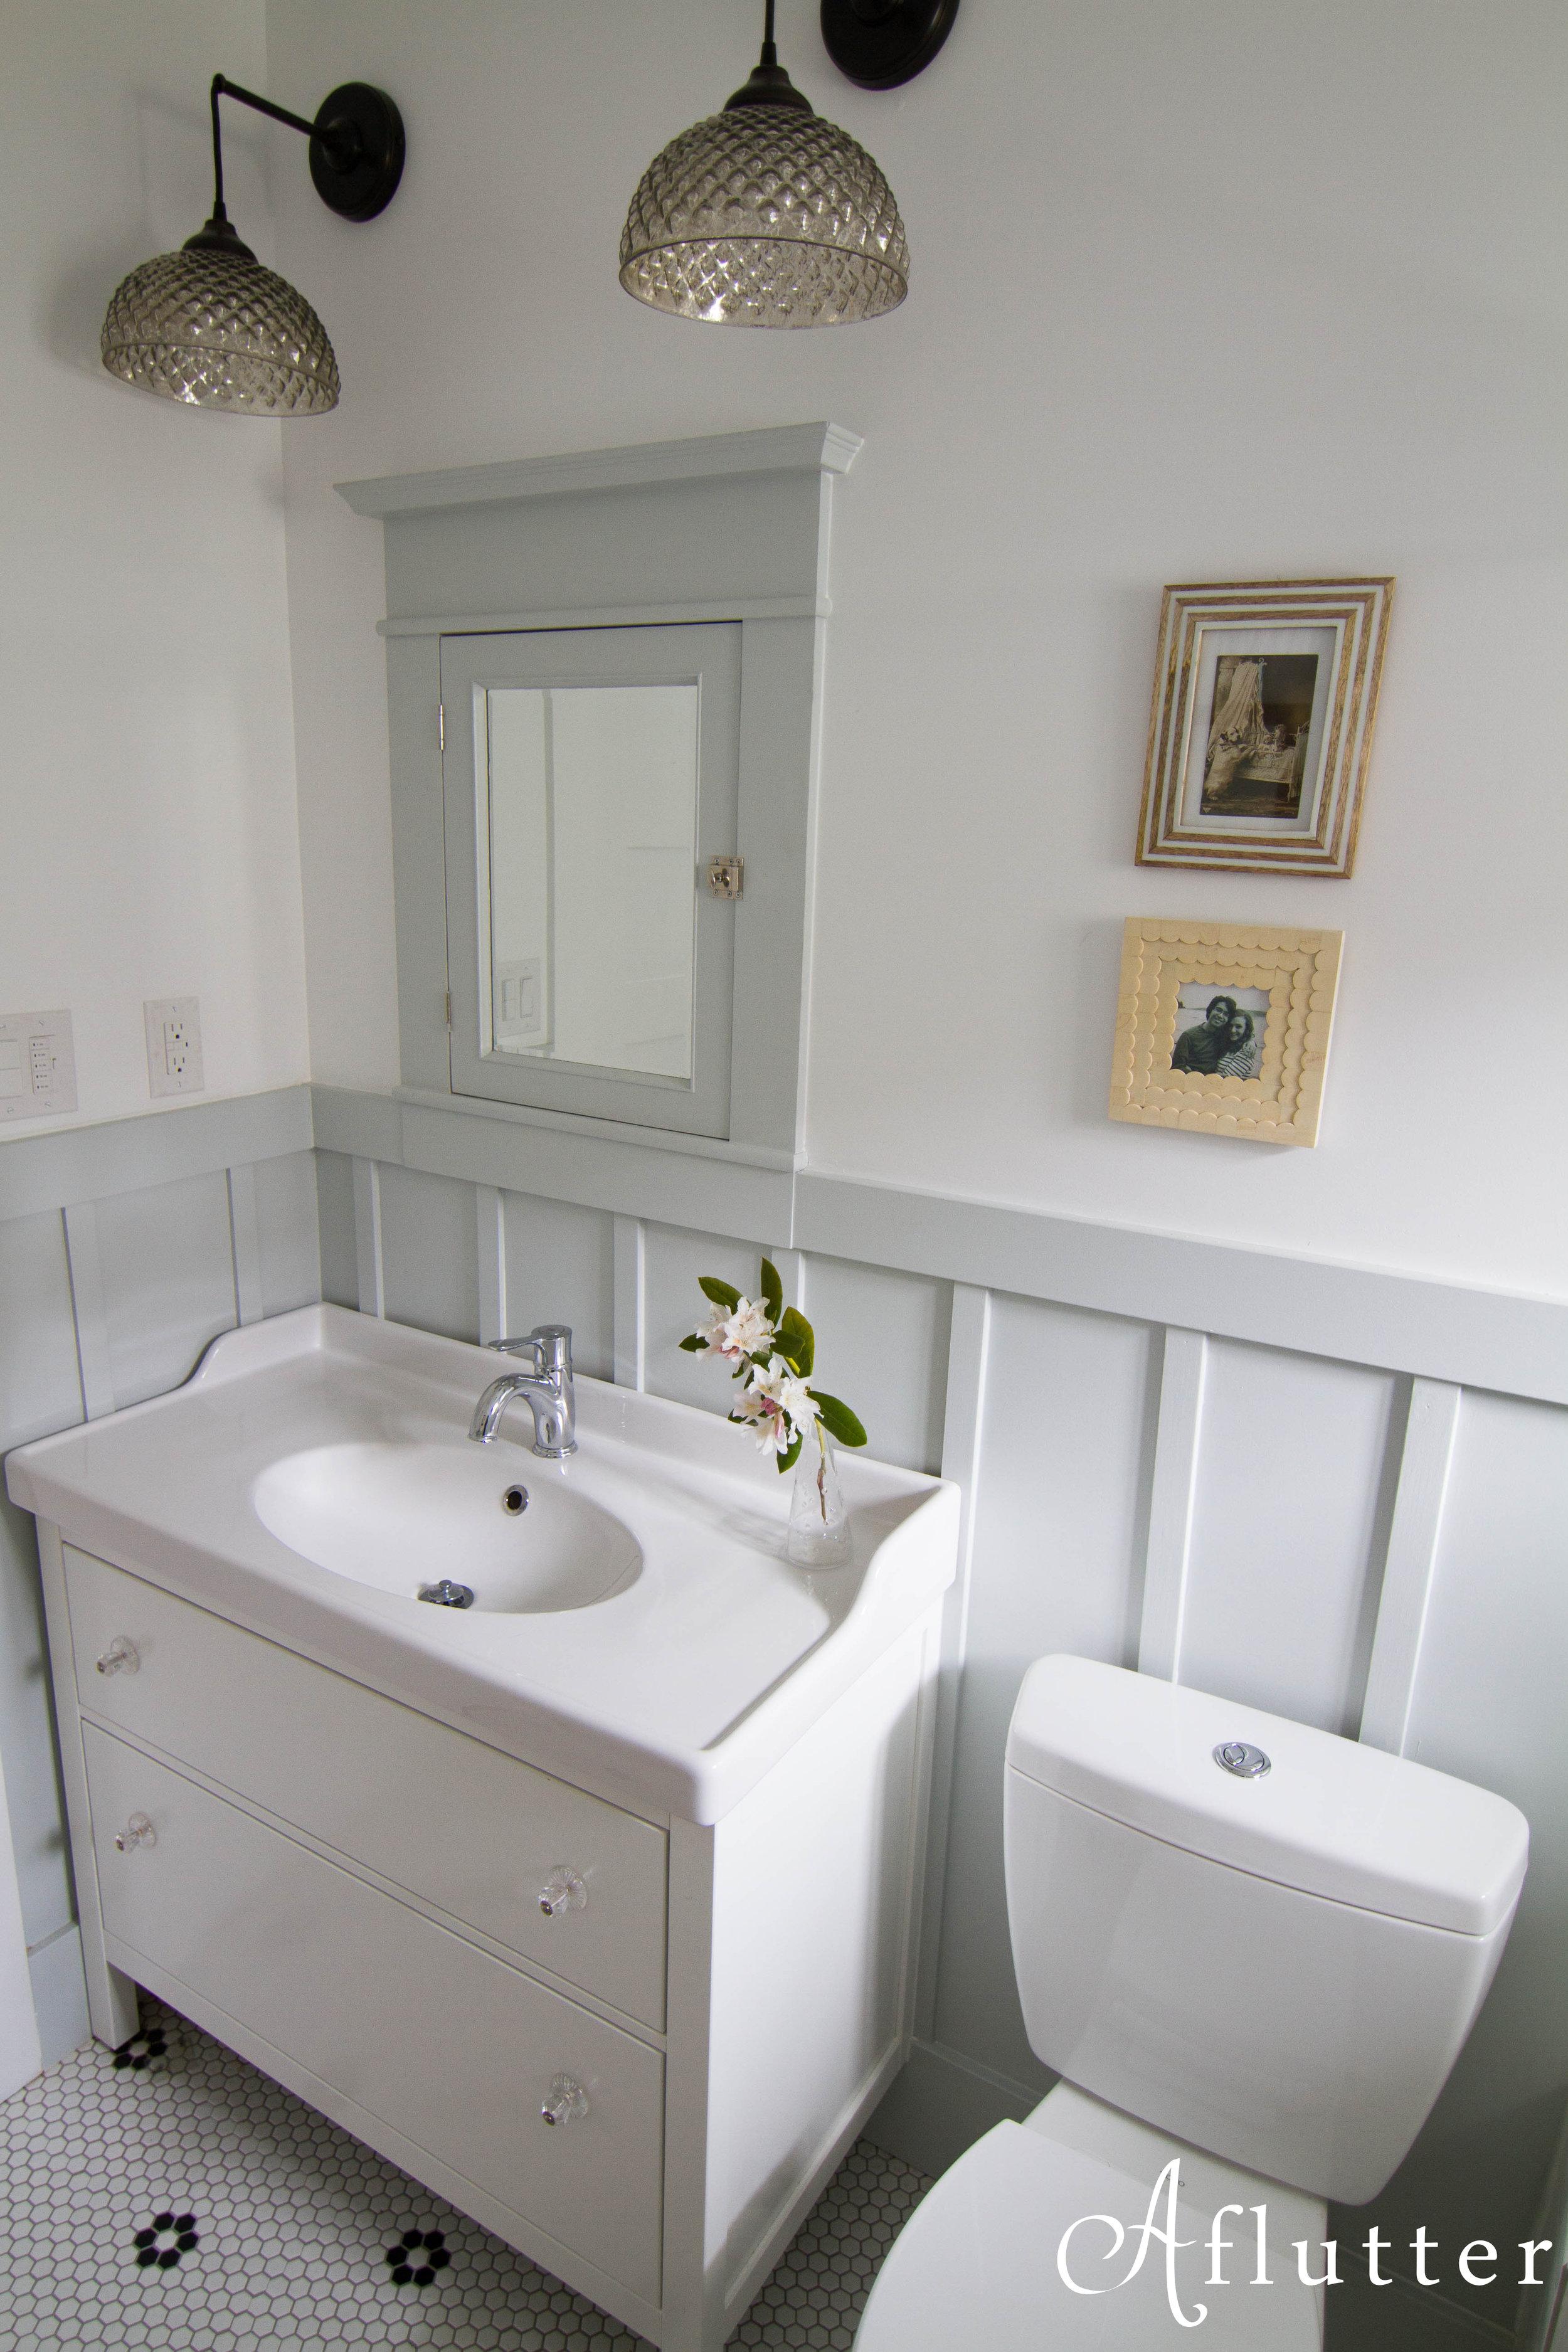 Bath-Remodel-3-of-11.jpg